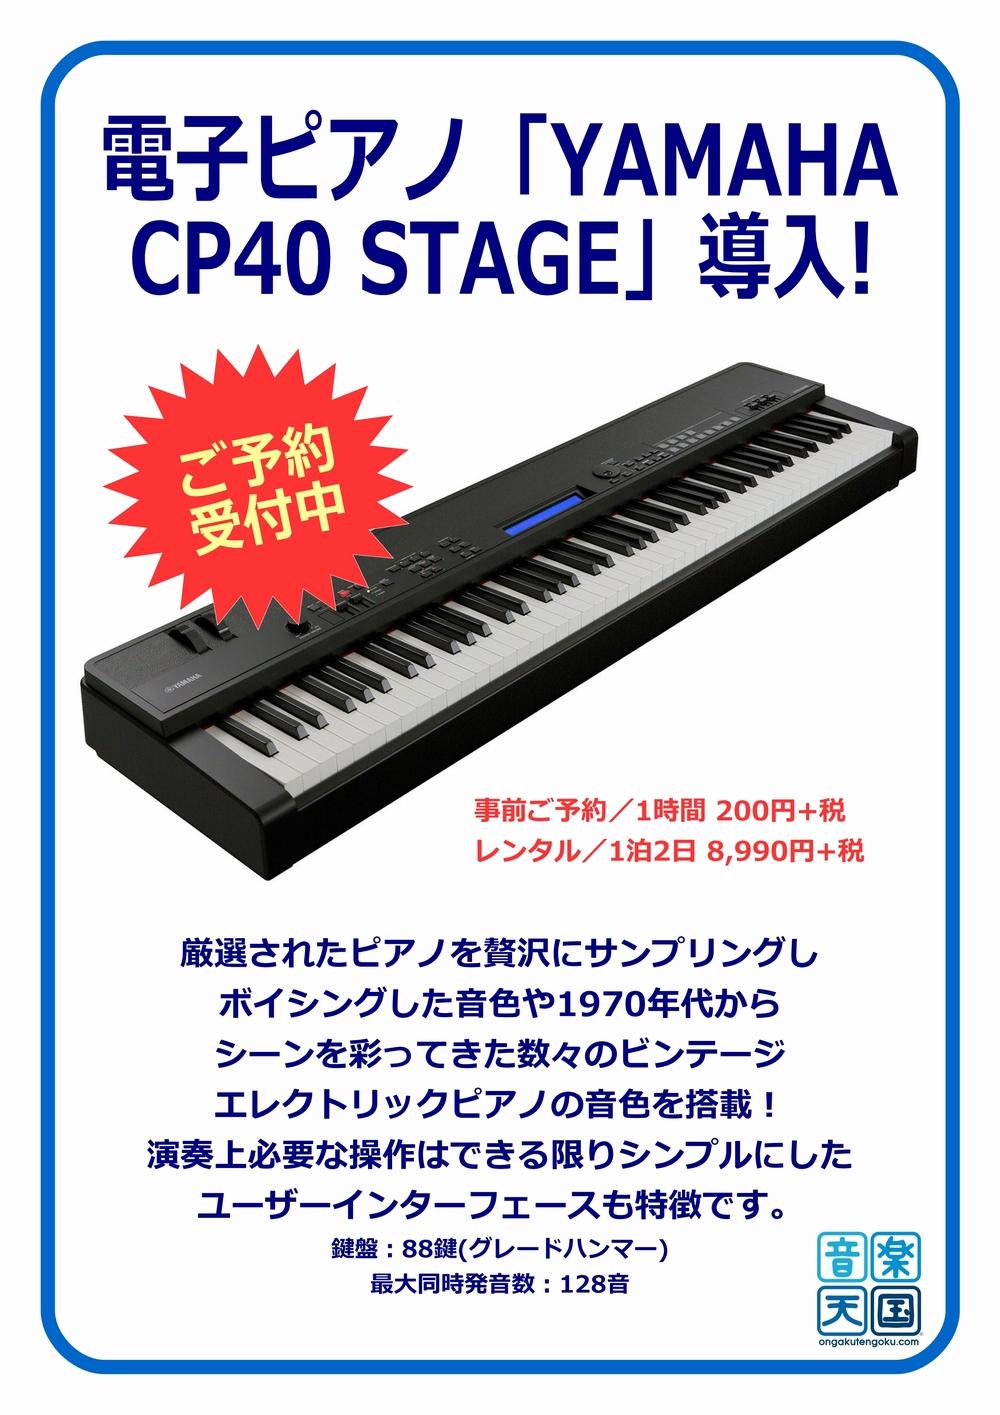 音楽天国・静岡草薙店でYAMAHA CP40 STAGE貸出